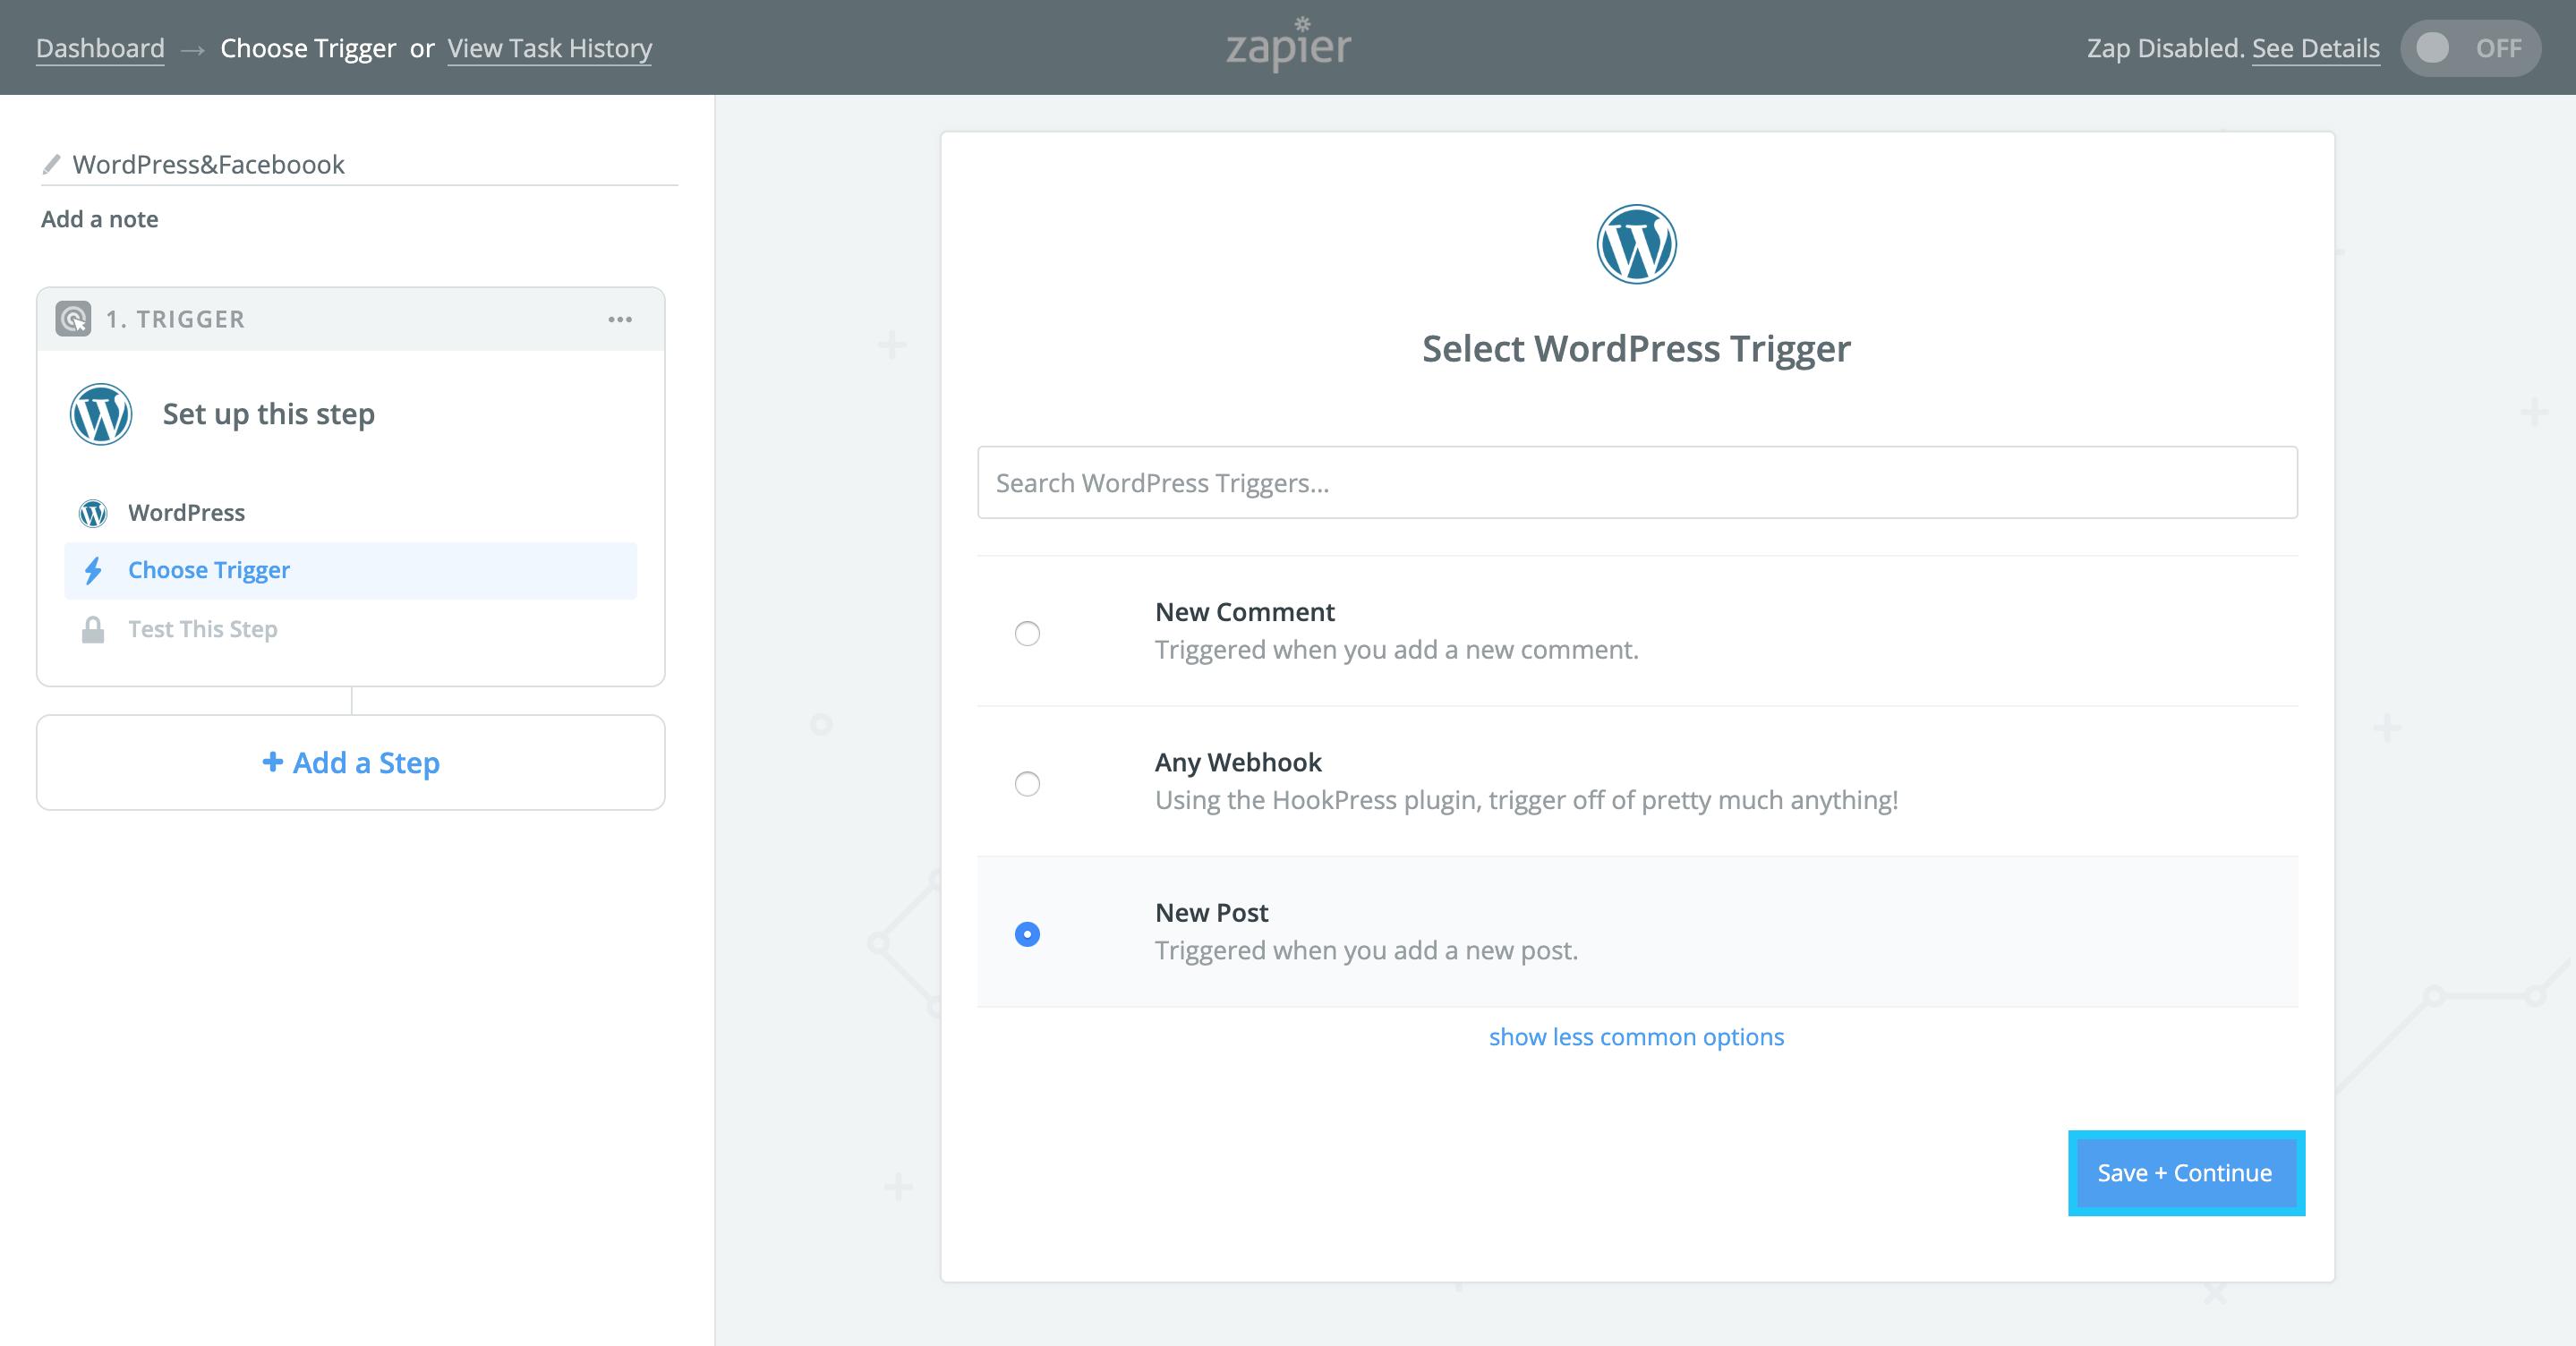 Zapierで「Select WordPress Trigger」で「New Post」を選択し「Save Continue」する